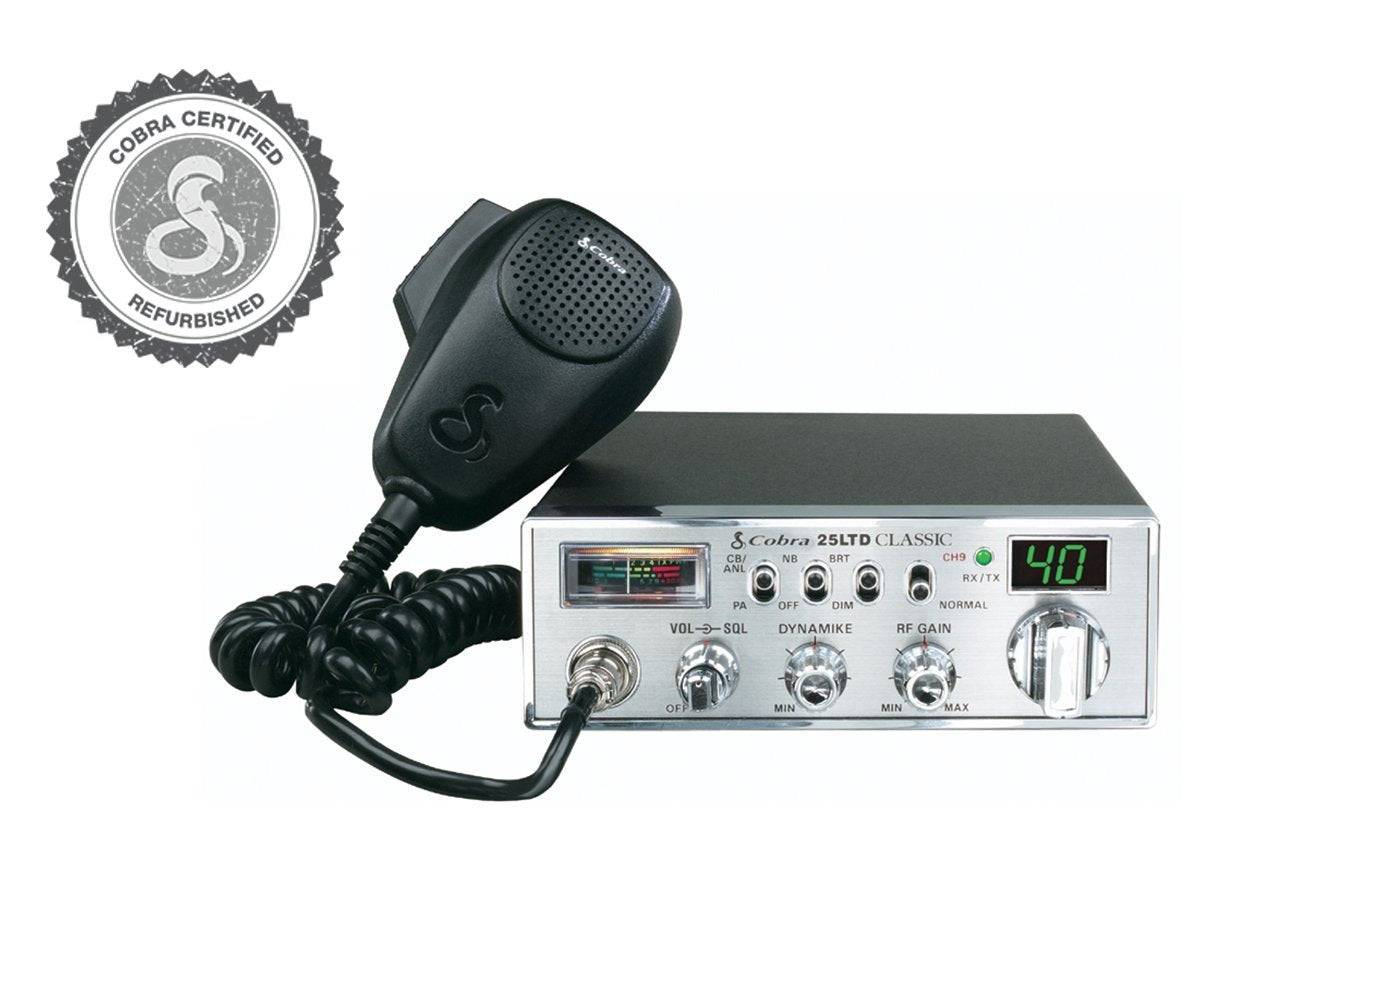 Cobra 25 LTD (Refurb) CB Radio w/ New Front Connection Mic